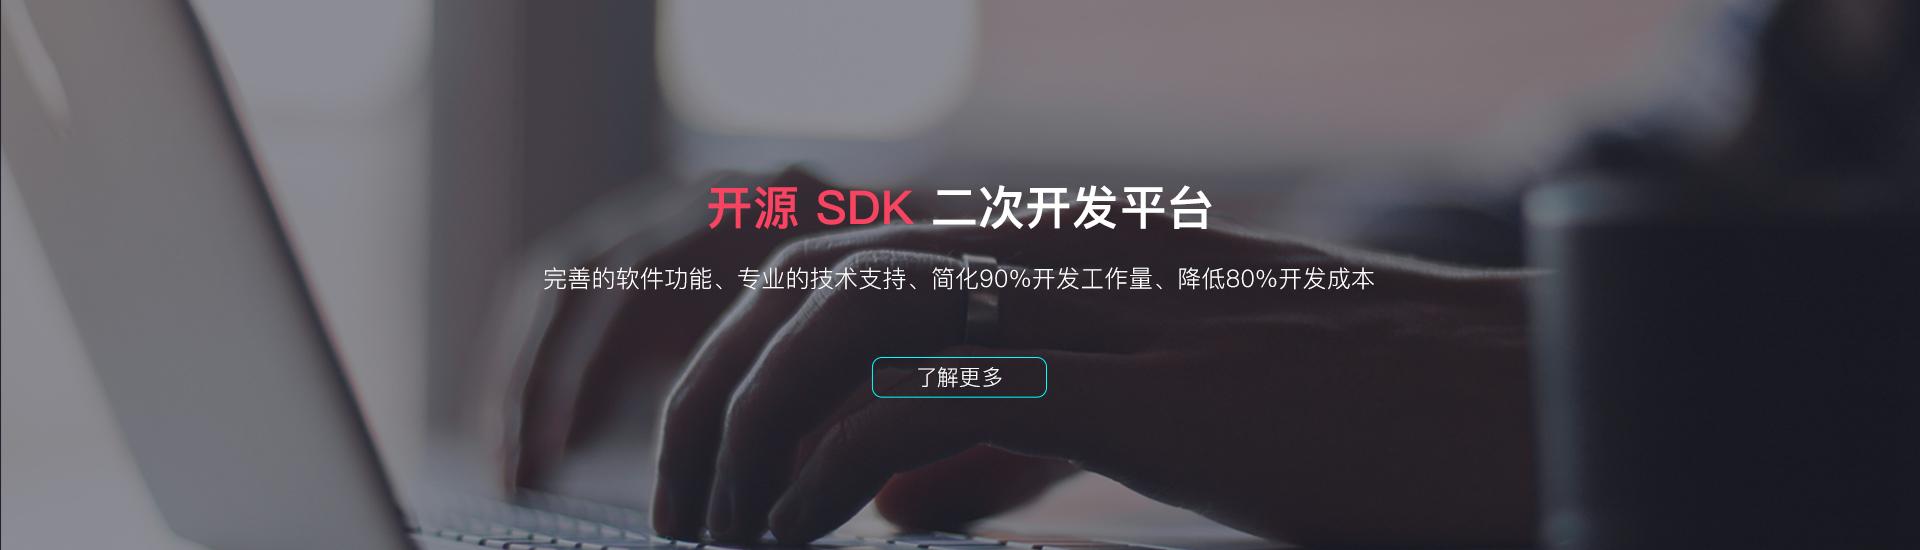 SDK二次开发平台